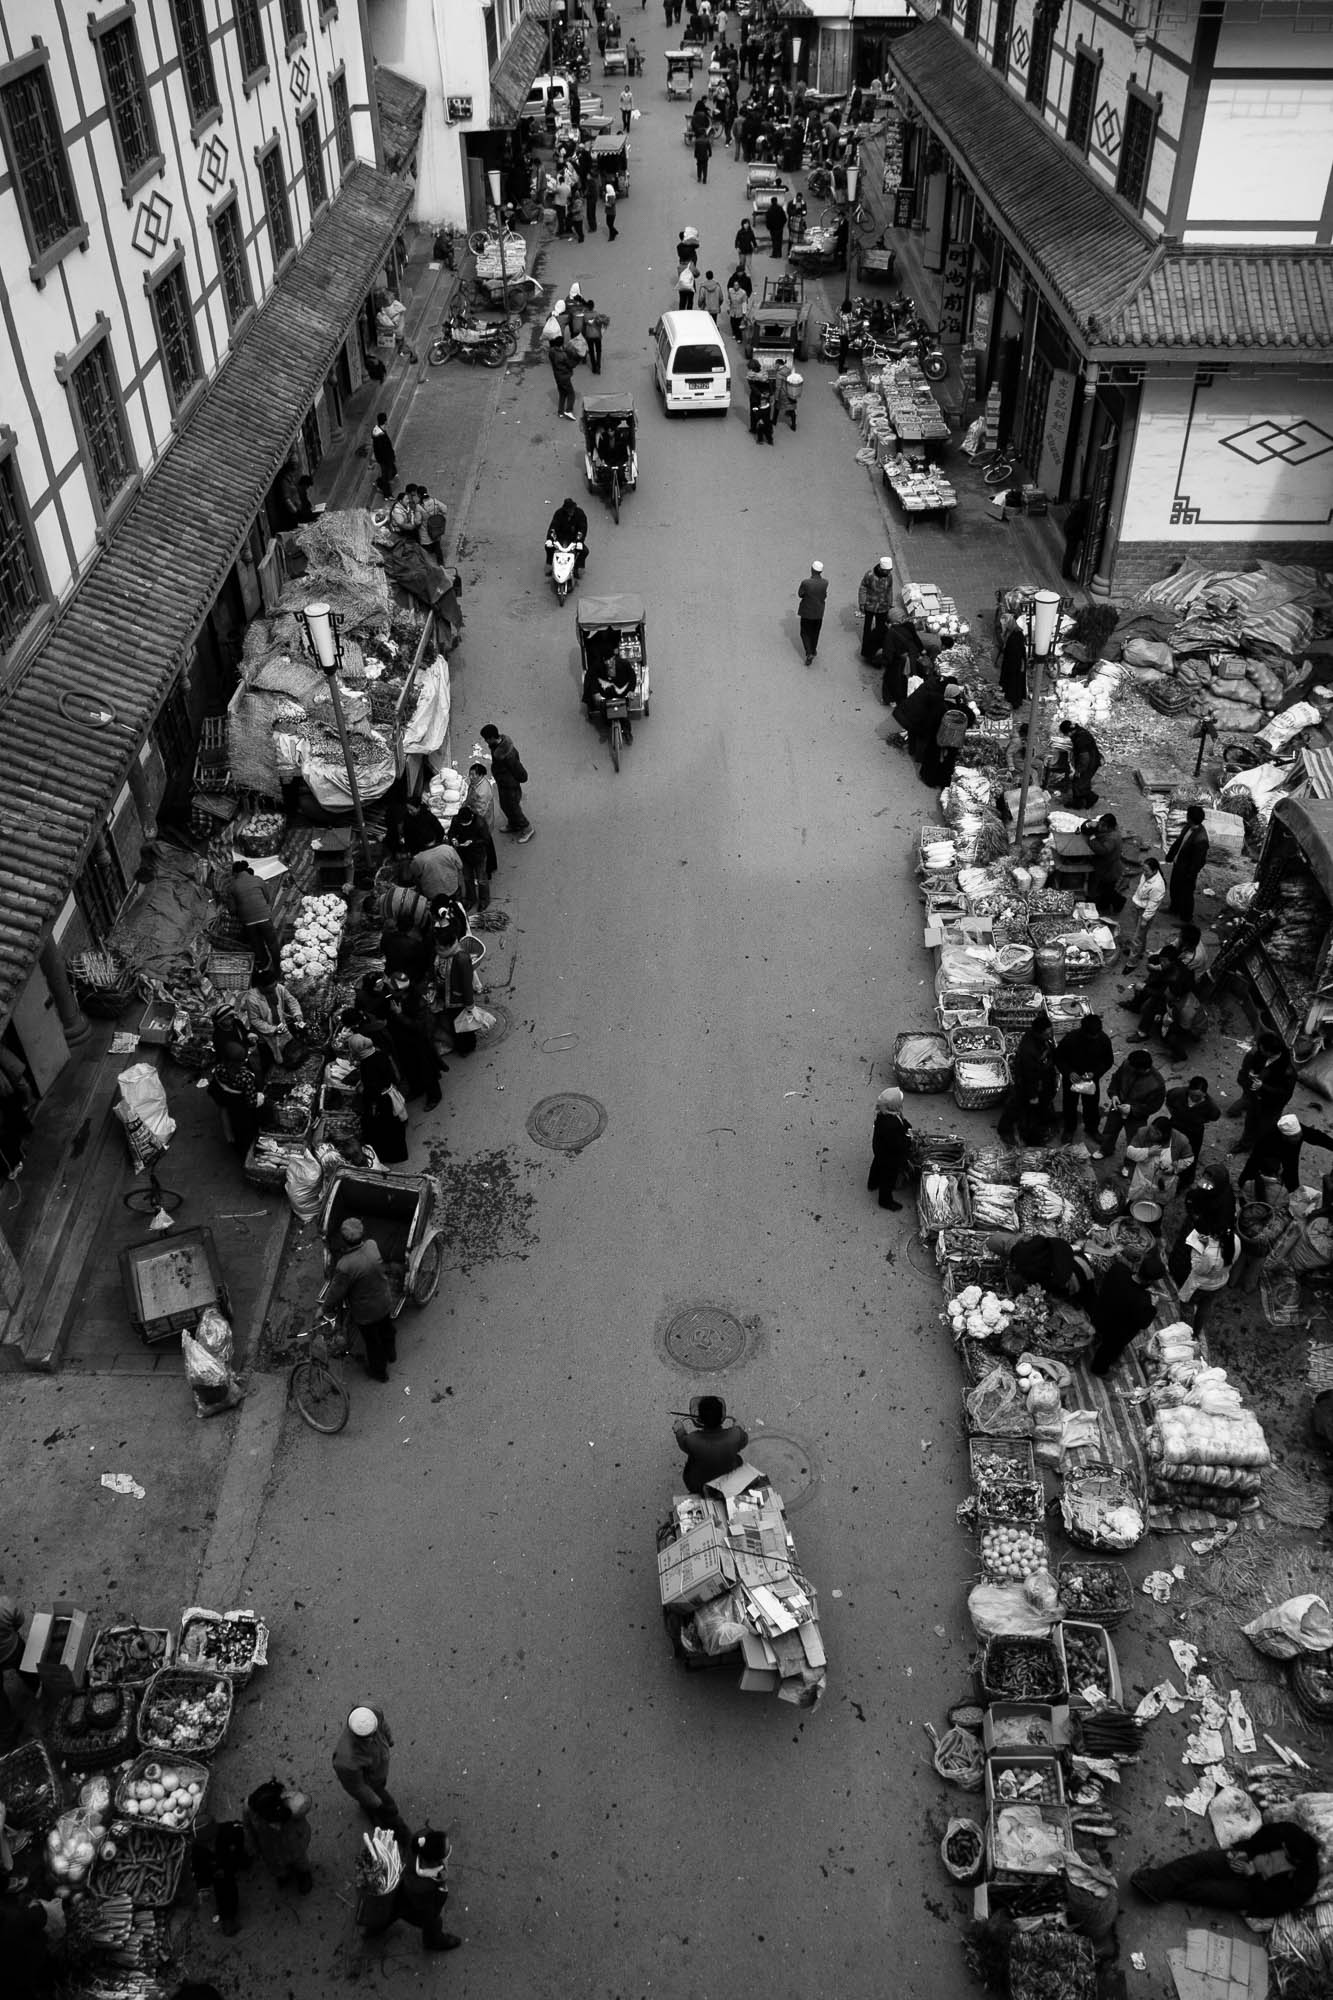 Sichuan 2006 street scene